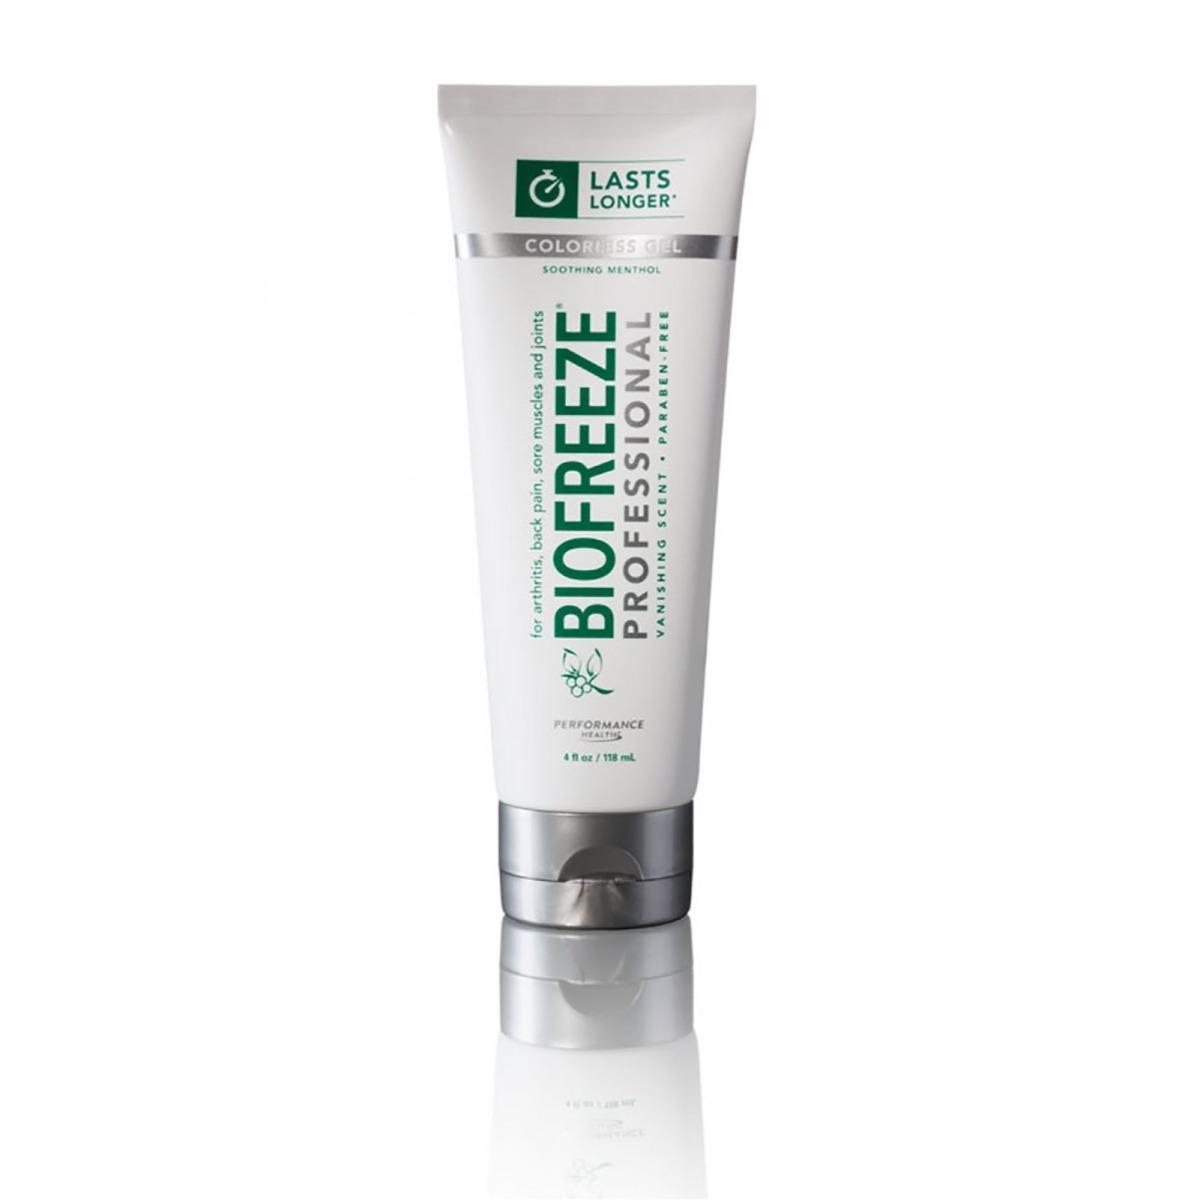 Biofreeze Professional, 4 oz Gel Colorless